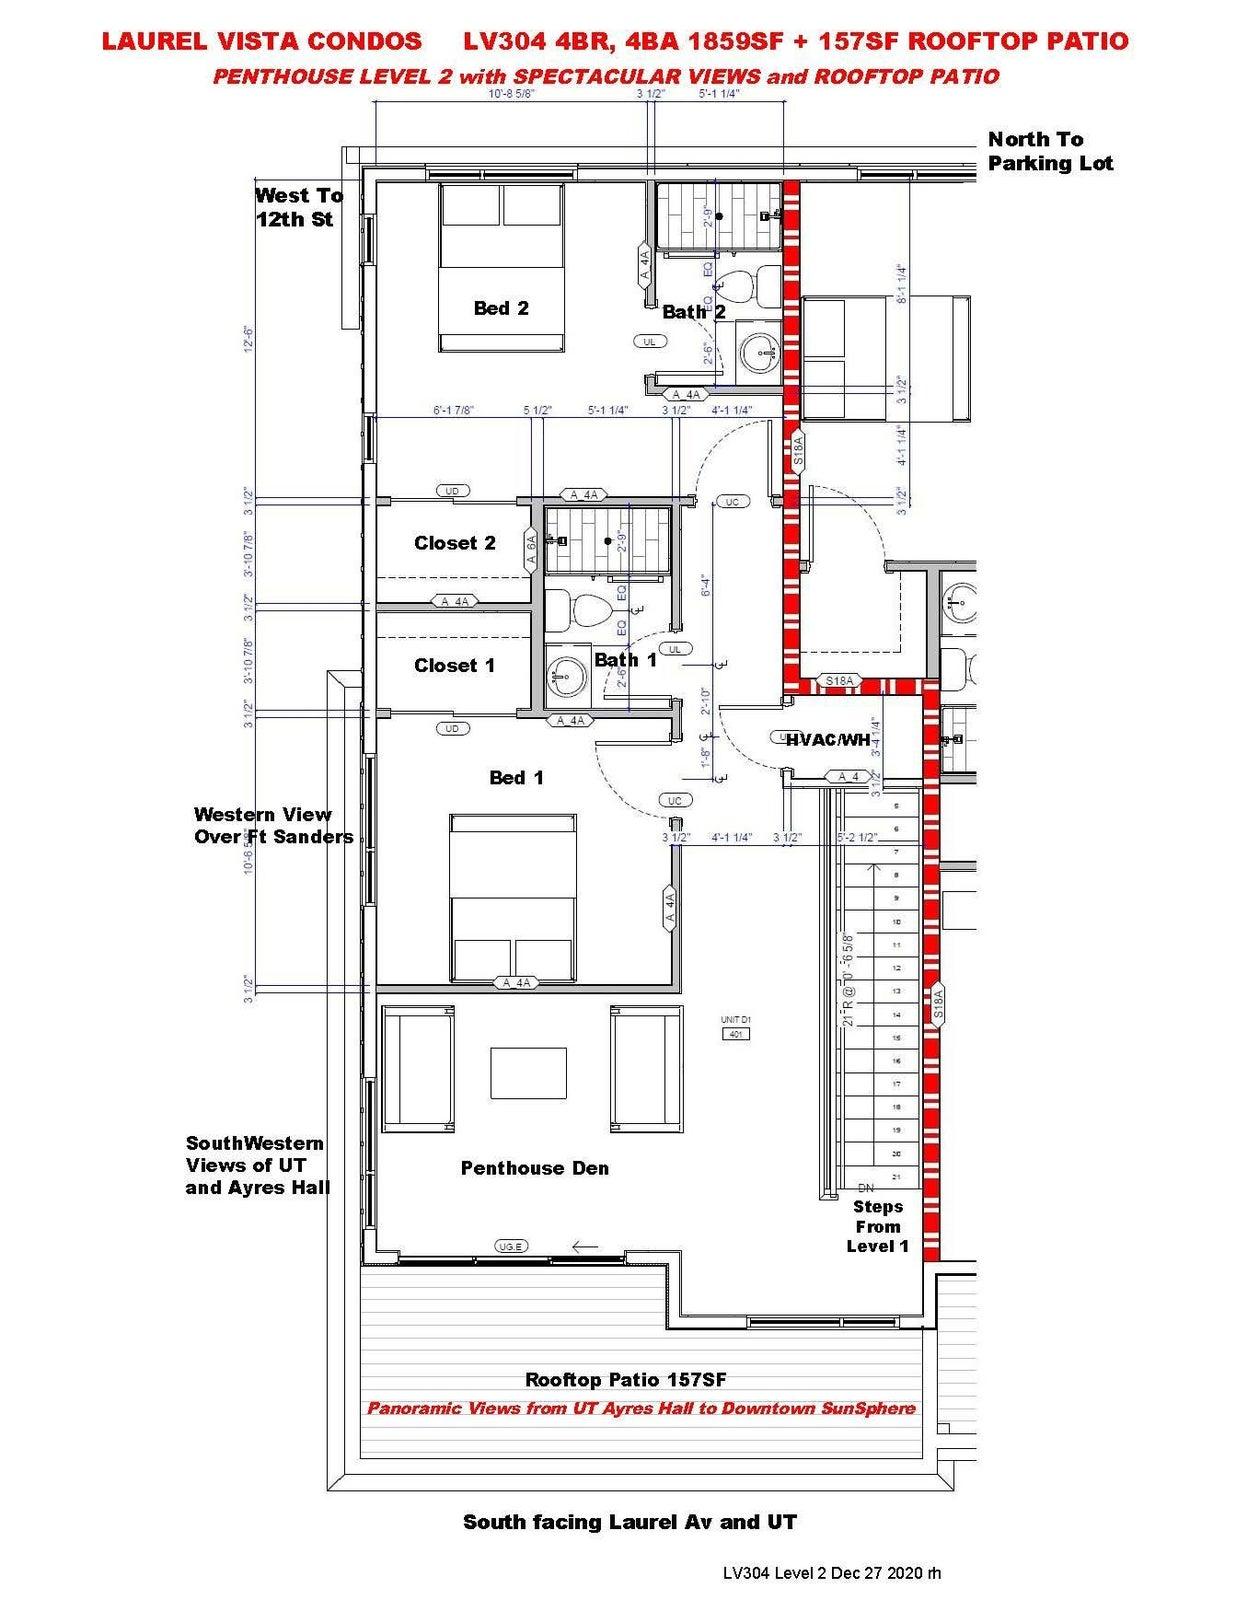 LV304 4BR,4BA Penthouse Level 2 - Floorp